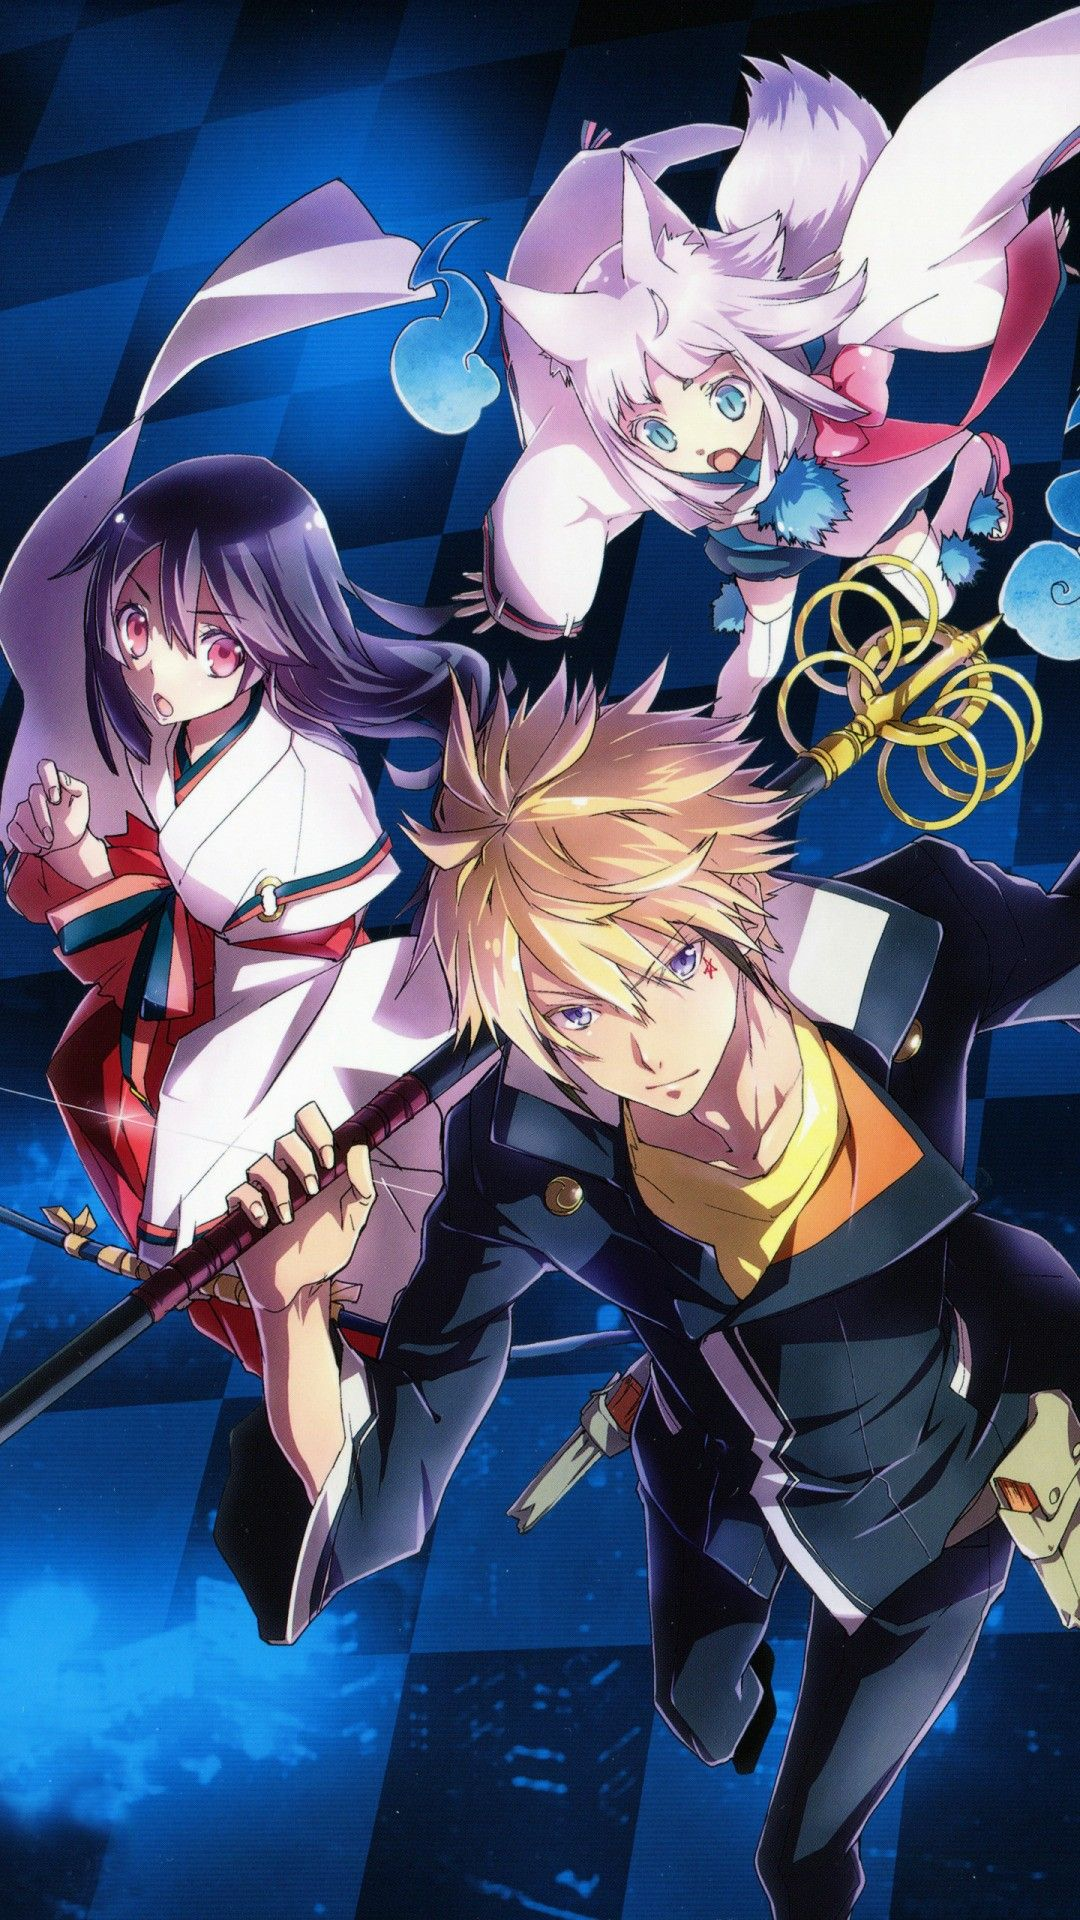 Pin by Mad Otaku on Tokyo Ravens Tokyo ravens, Anime